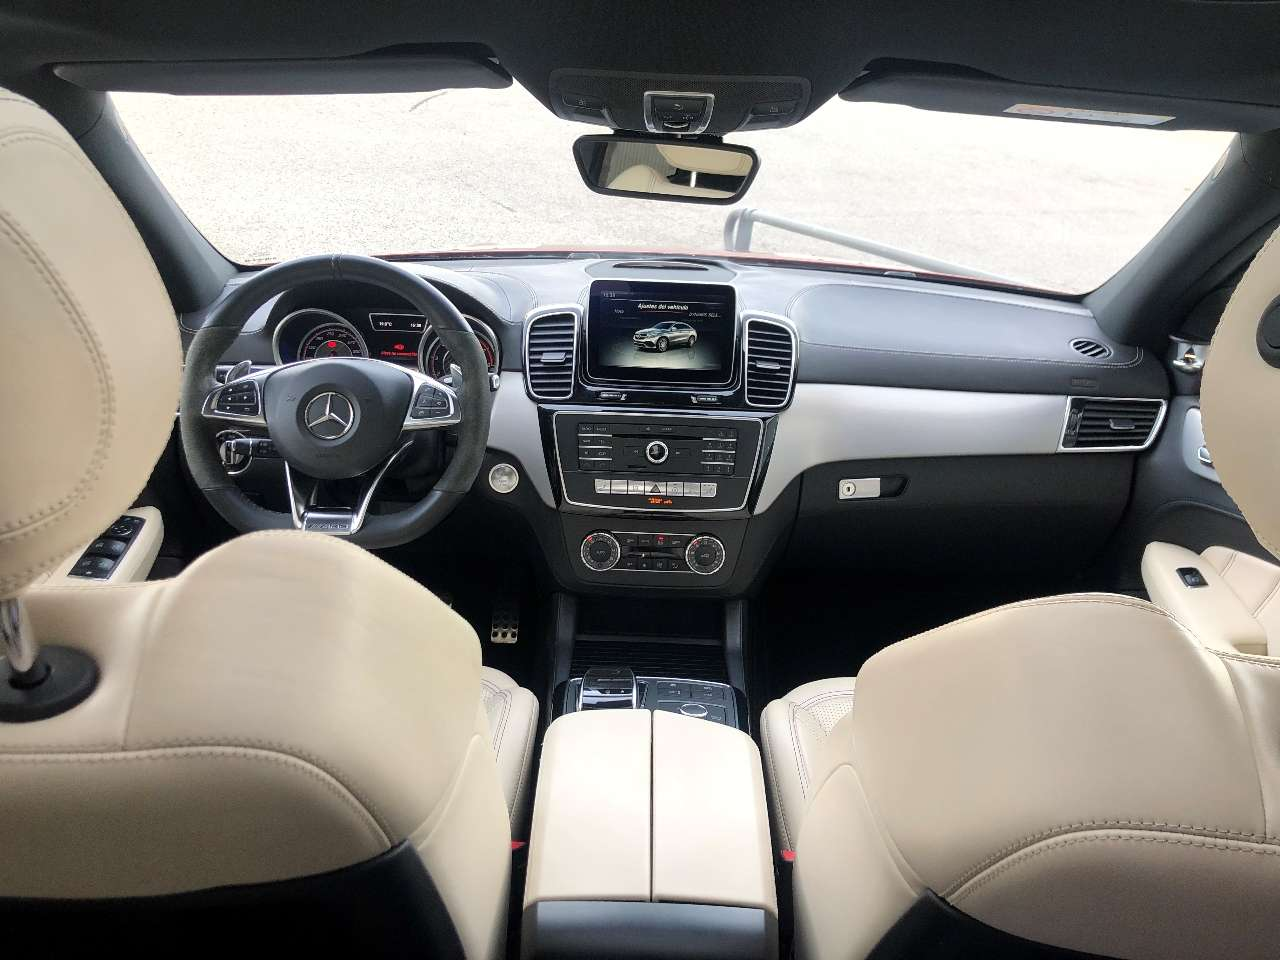 Mercedes Benz GLE 63 AMG S Interior